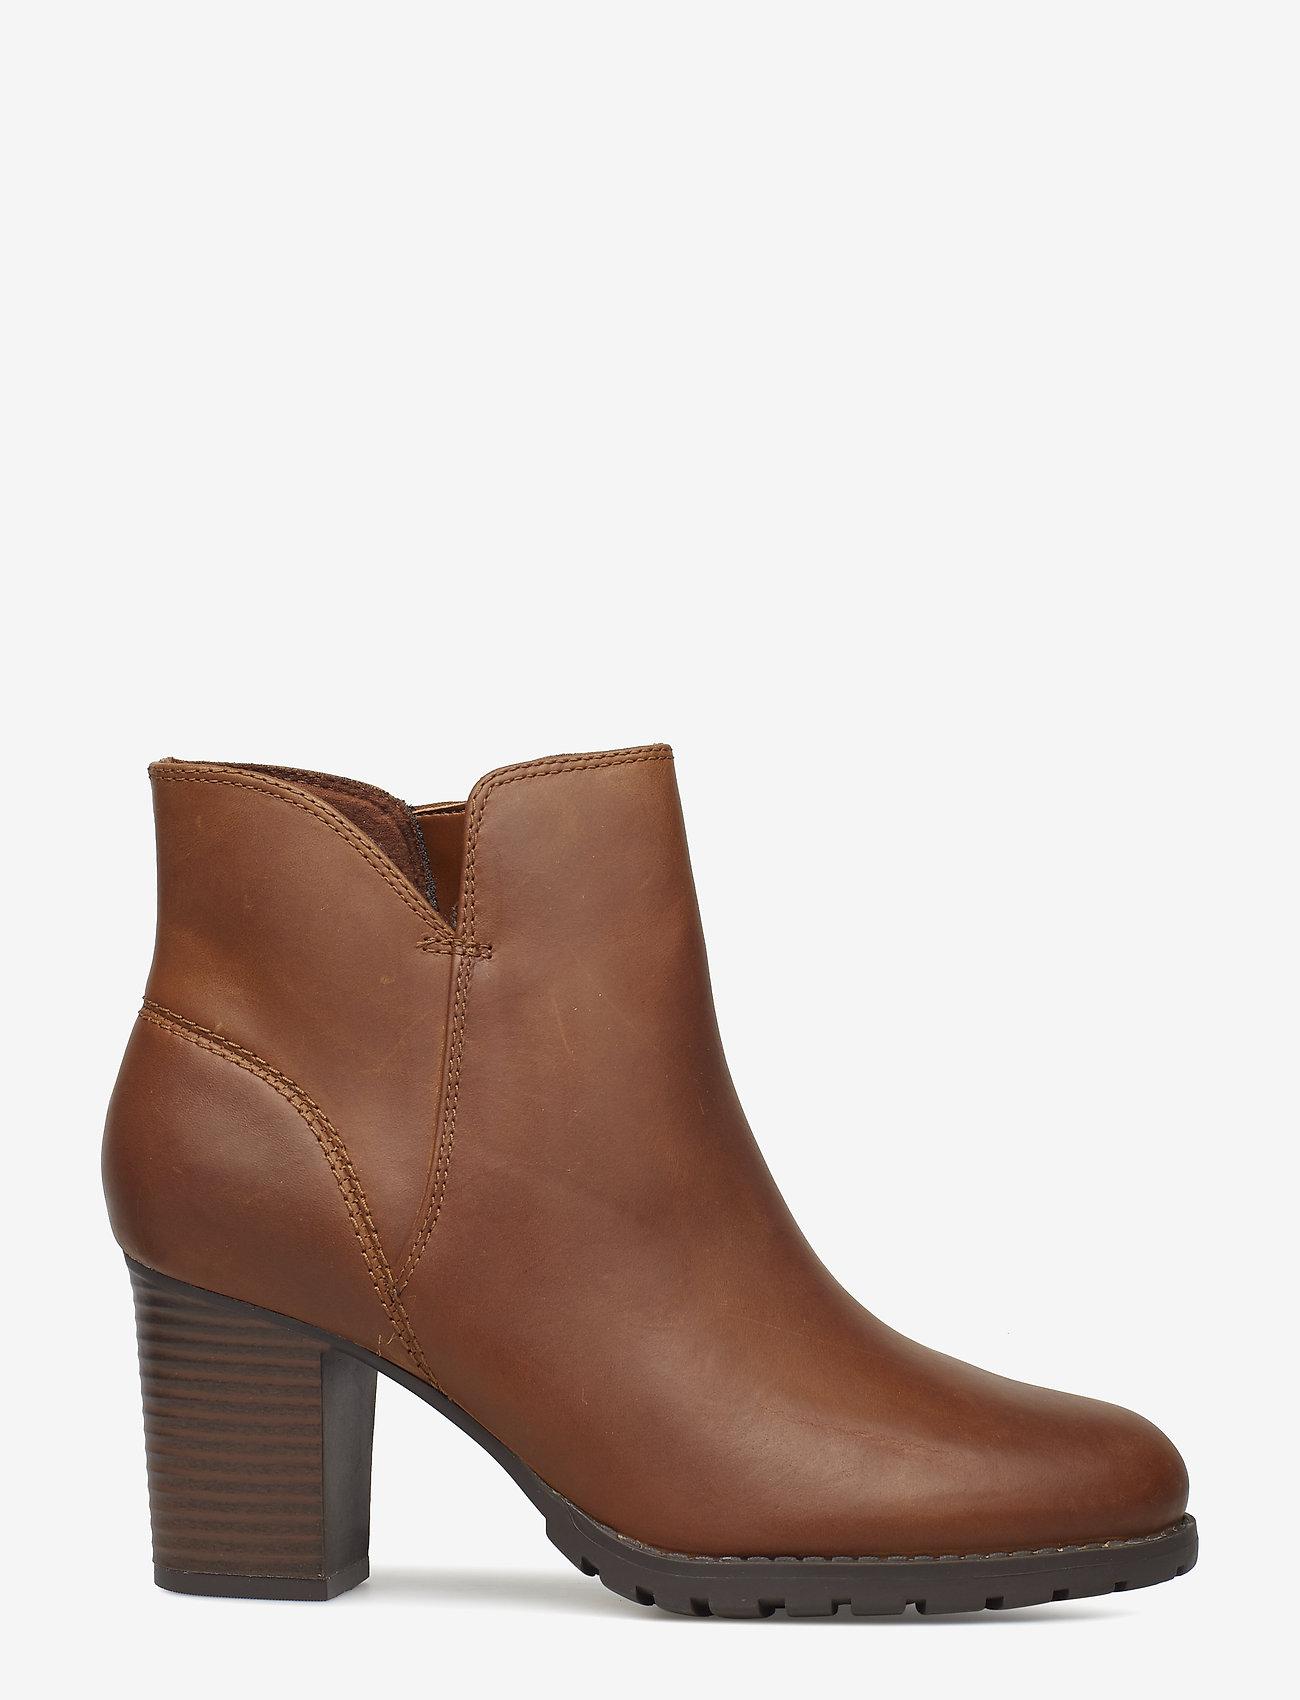 Clarks - Verona Trish - ankelstøvler med hæl - dark tan lea - 1